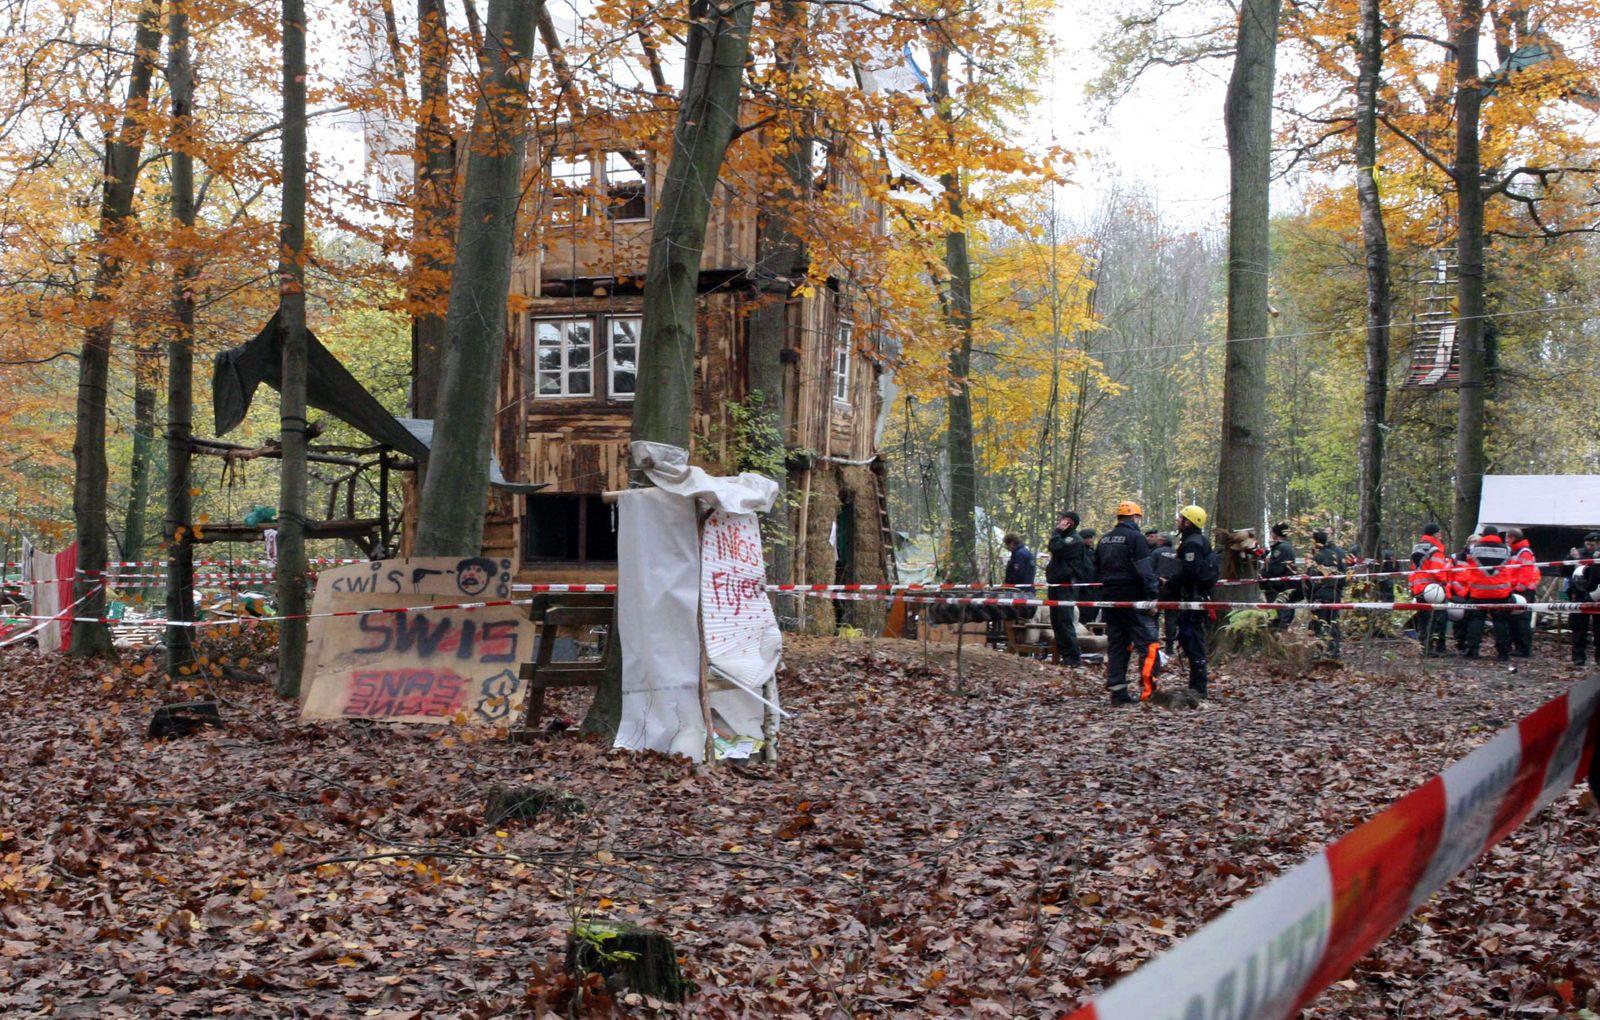 Umweltaktivist Erdloch Hambacher Forst